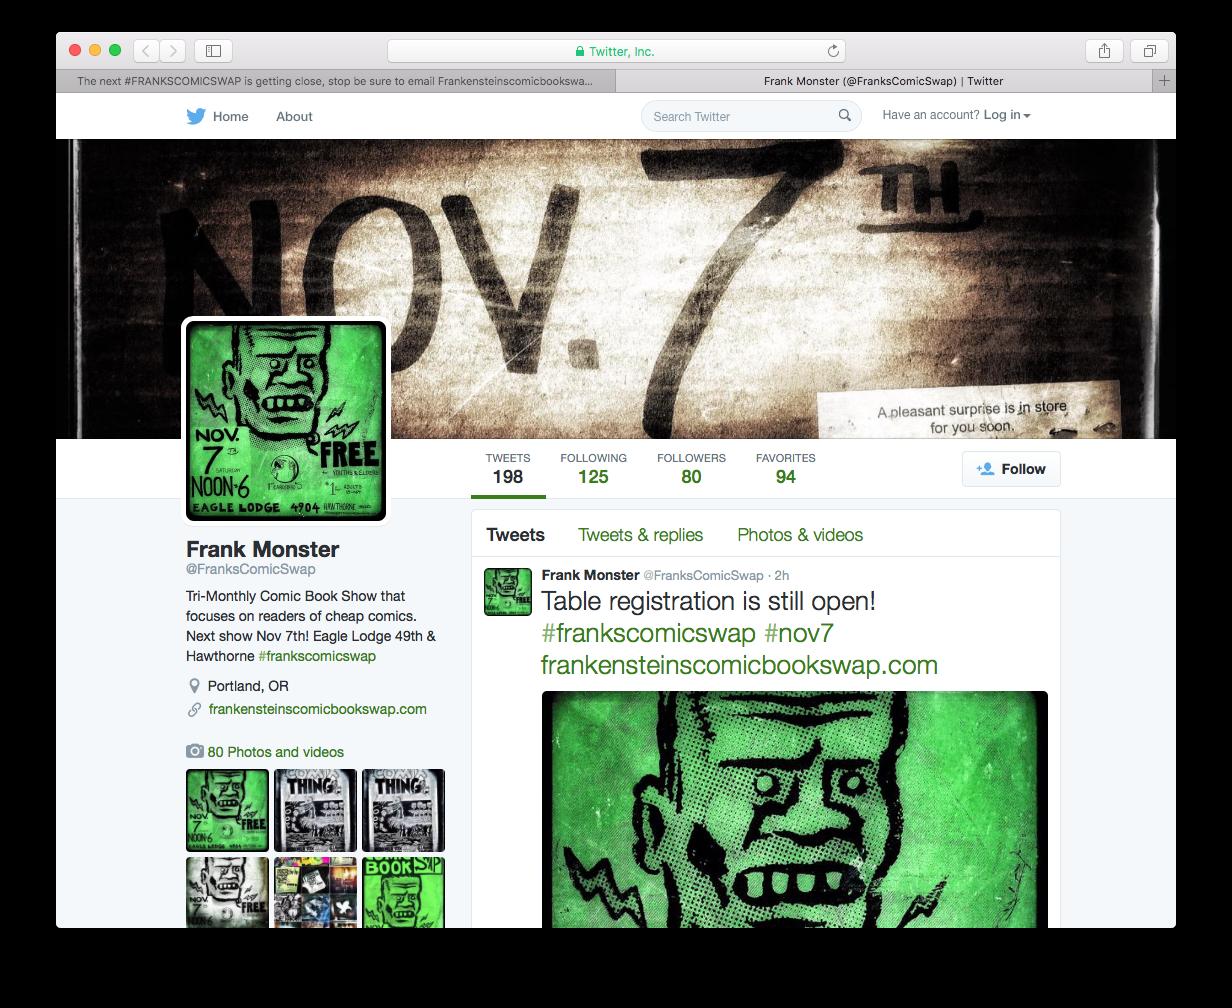 Screenshot 2015-10-08 18.40.31.png